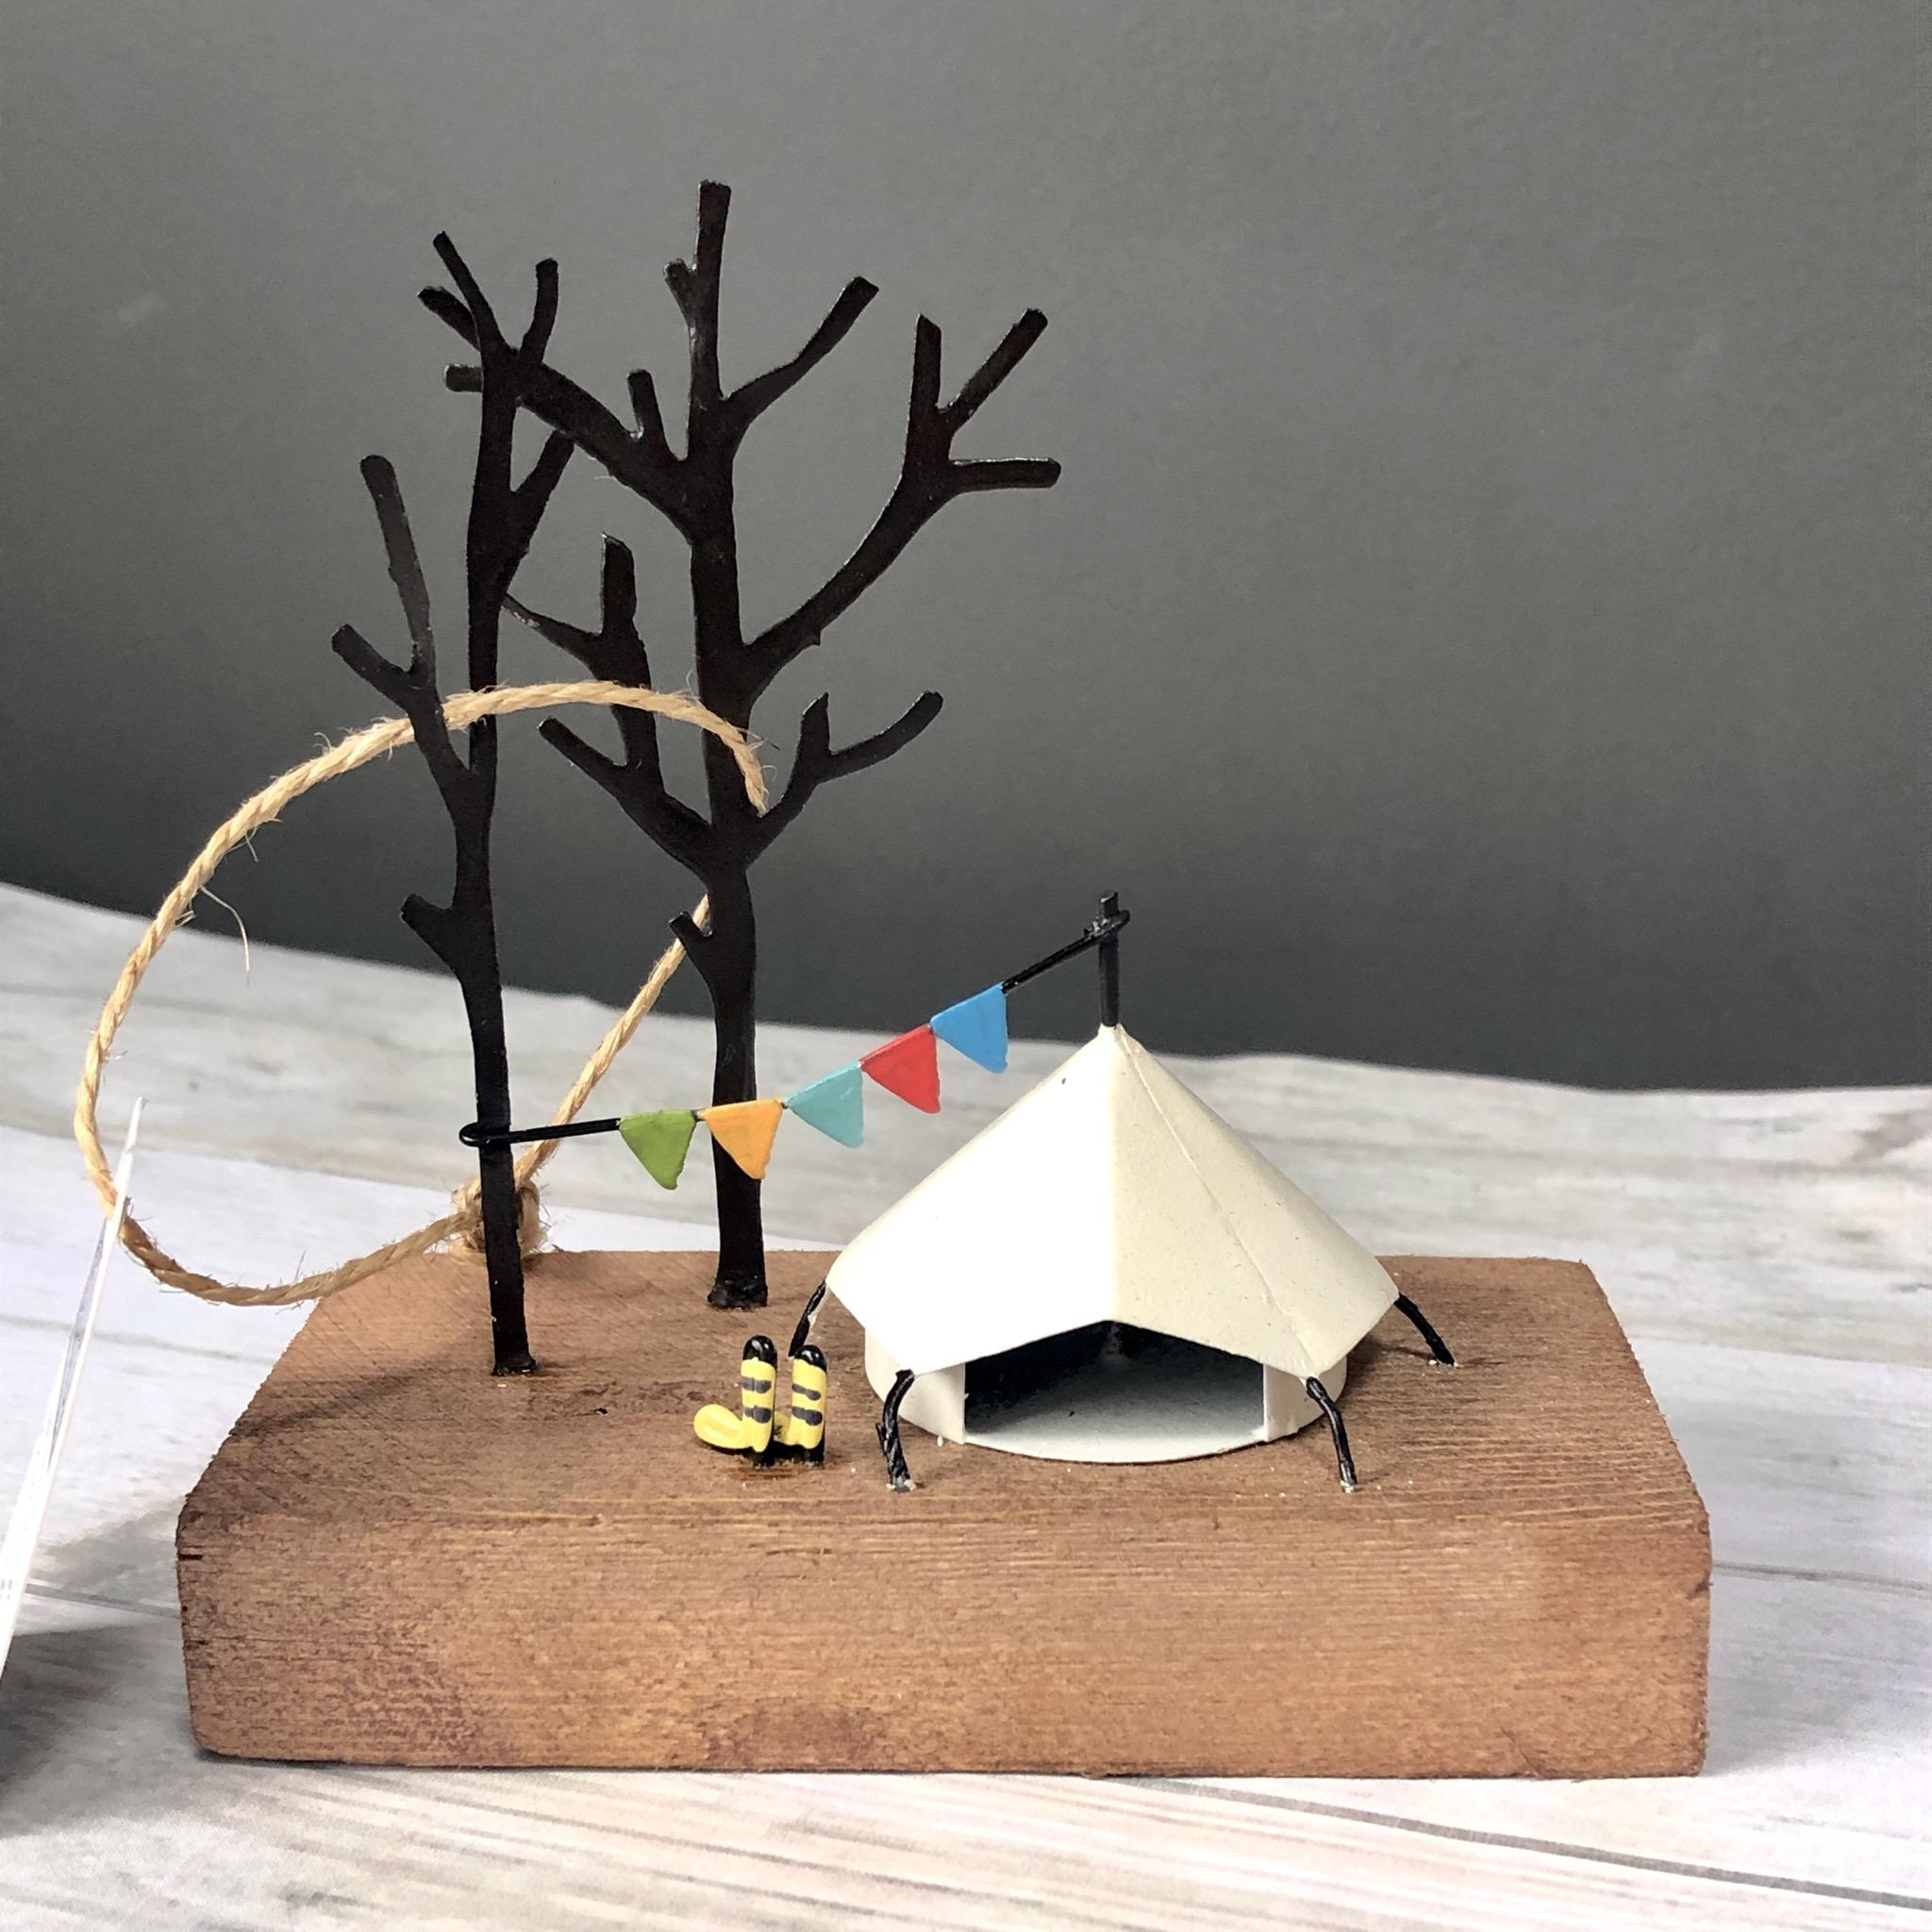 Festival tent camping ornament by shoeless joe